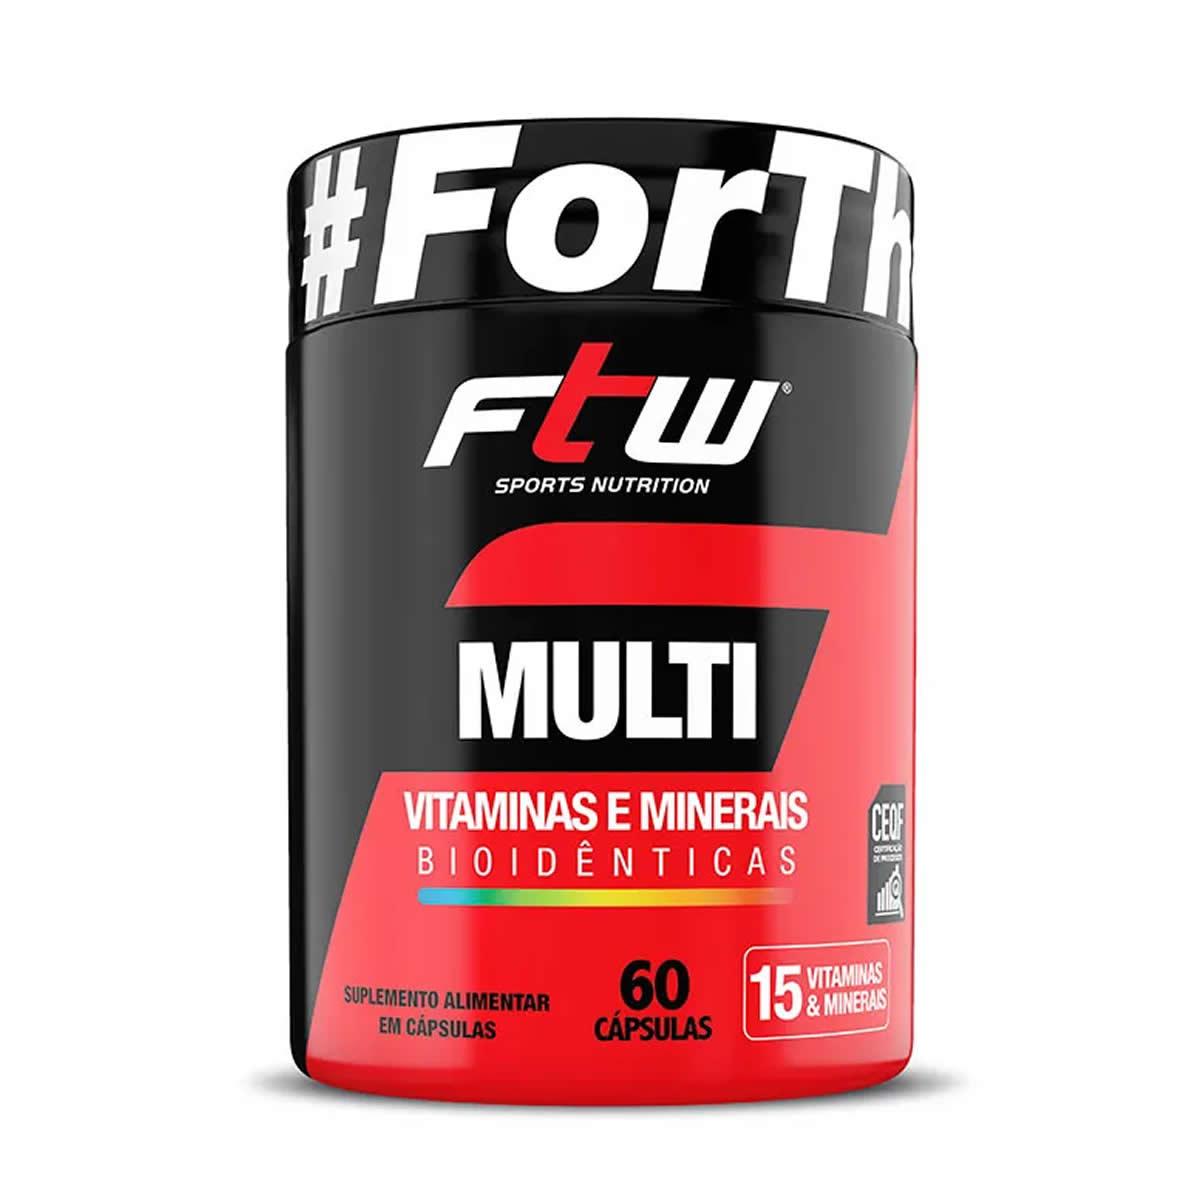 Multi Vitaminas e Minerais Bioidênticas 60 Cáps - FTW